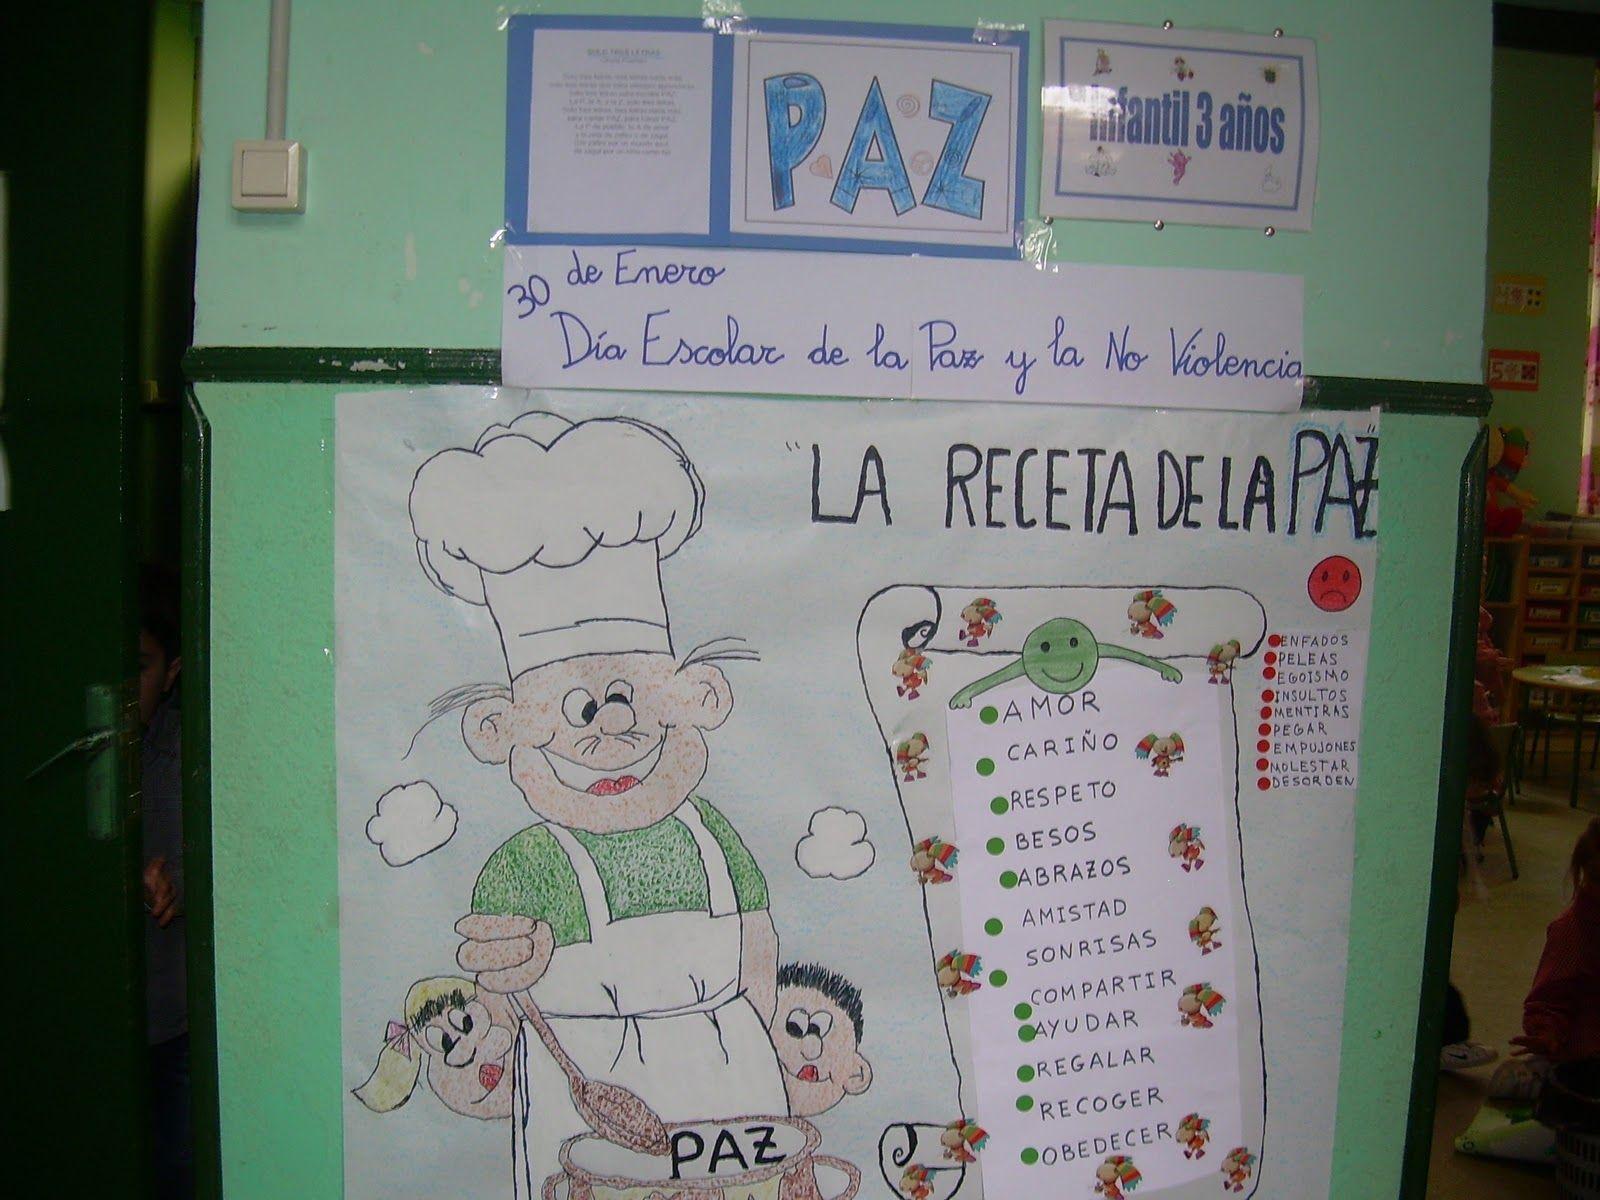 fiesta+de+la+paz+012.jpg (1600×1200)